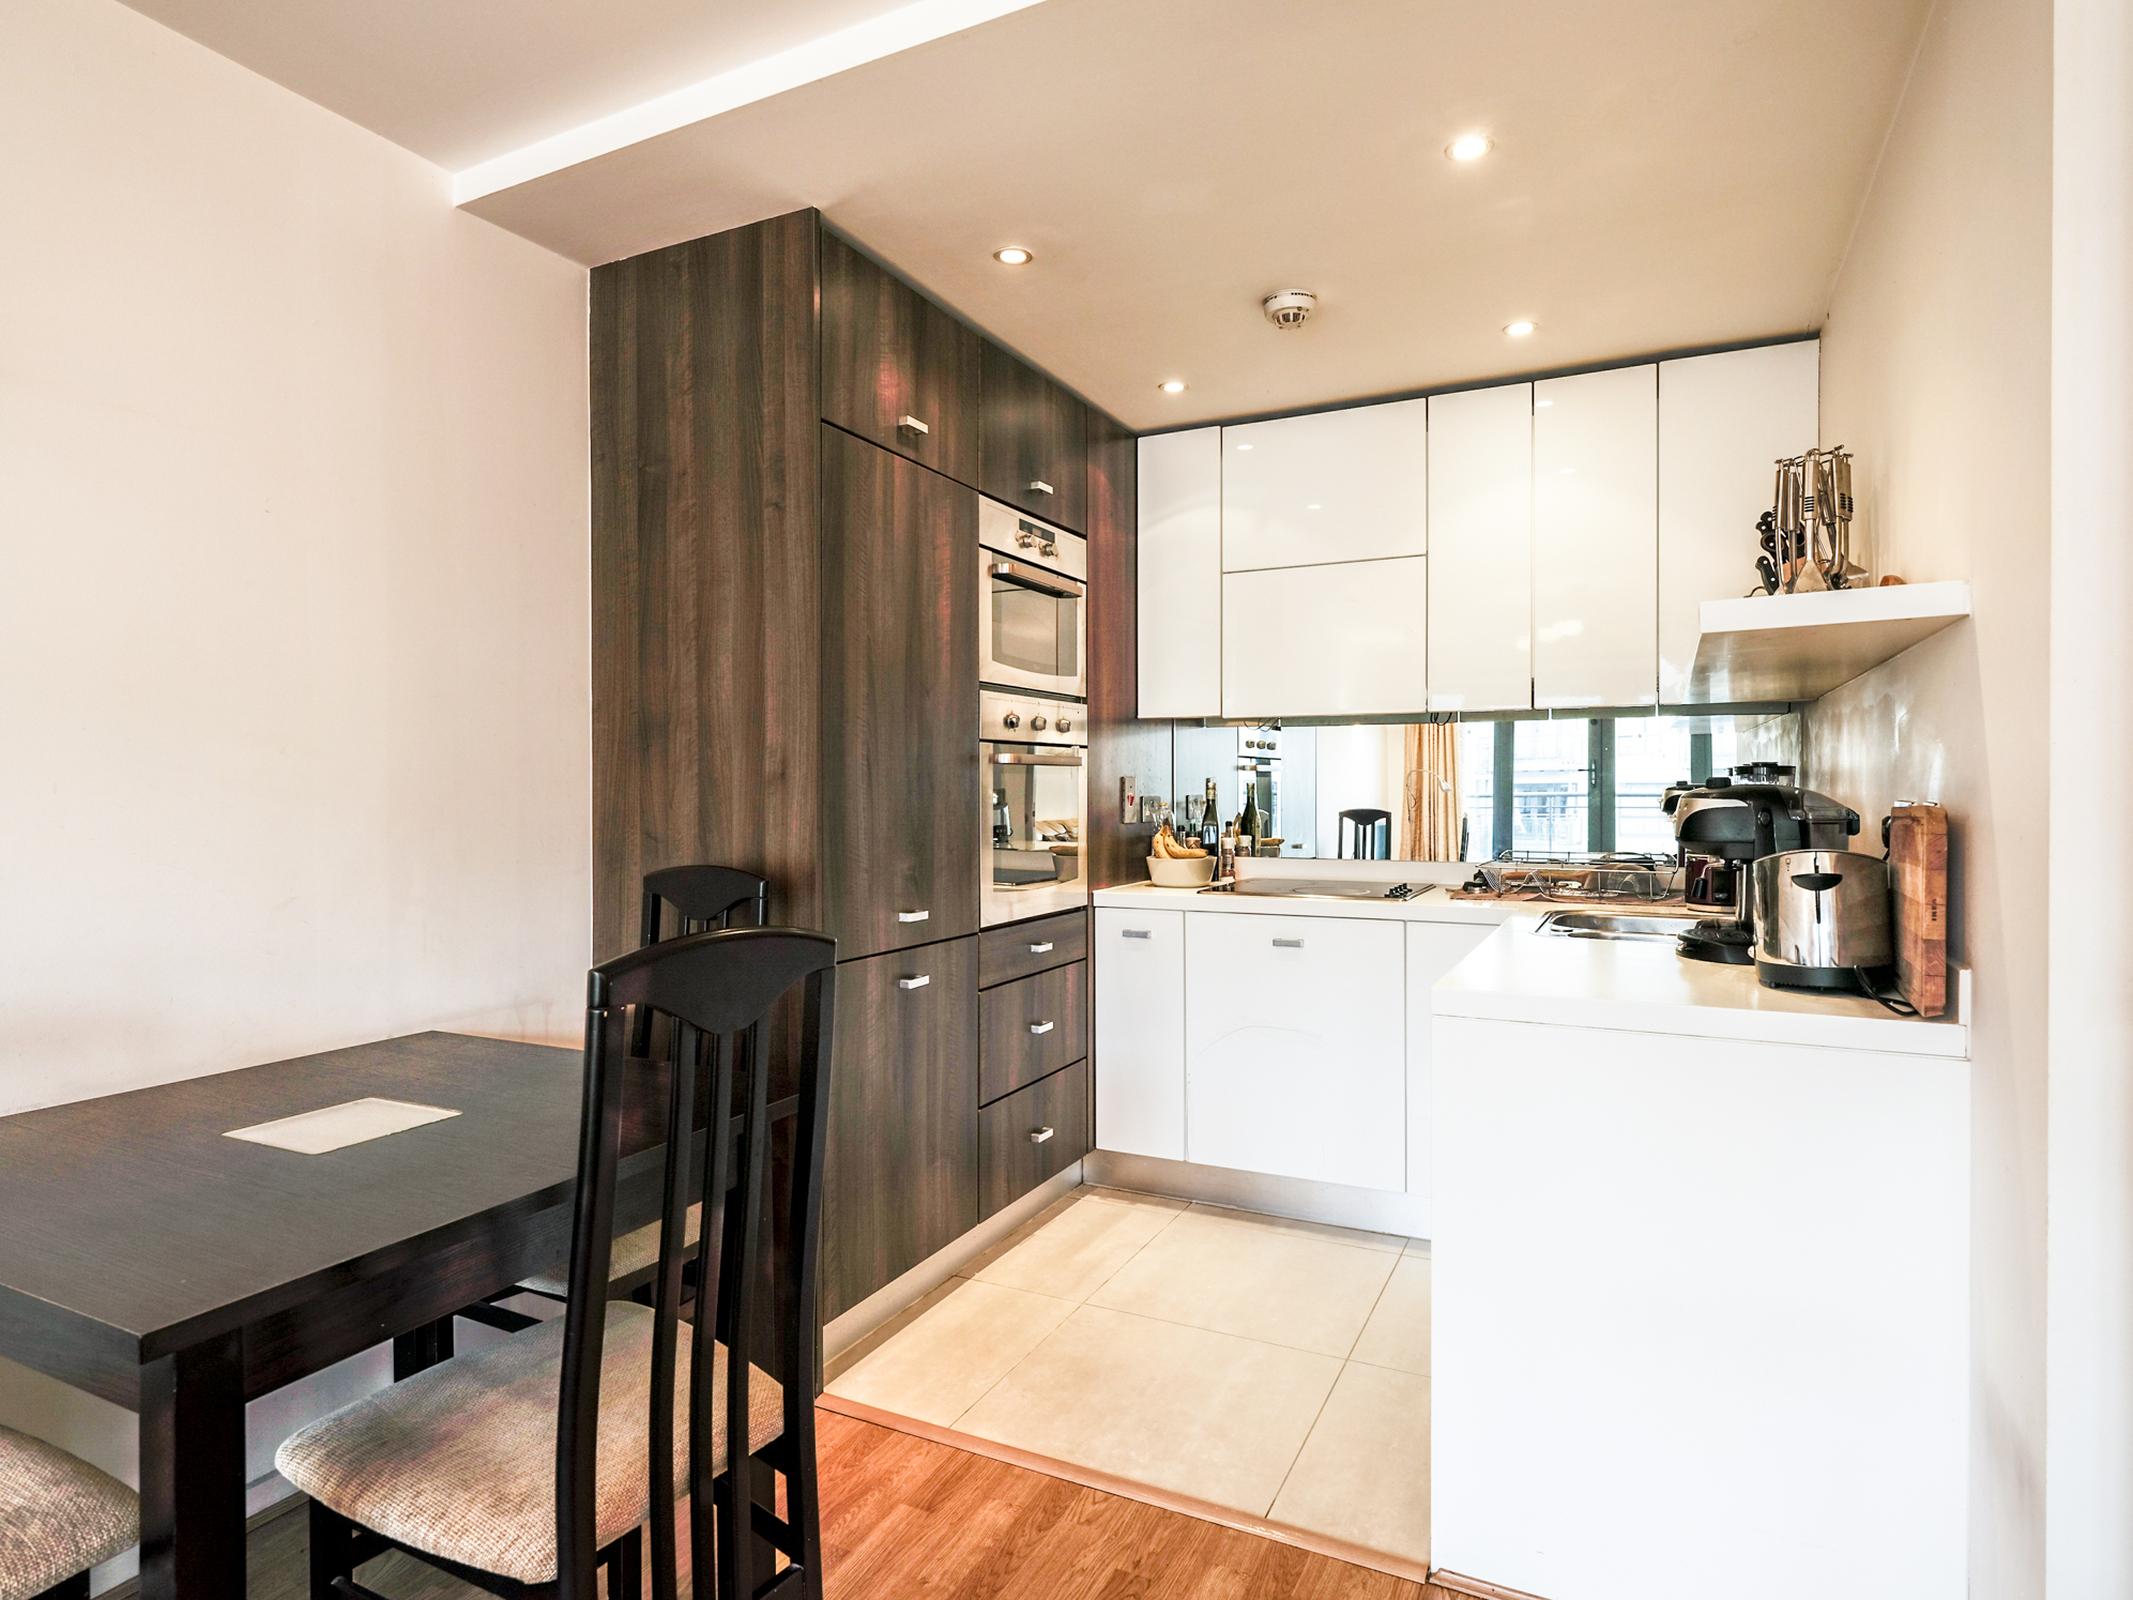 Apartment 125, Meridian Court, Ashtown, Dublin 15